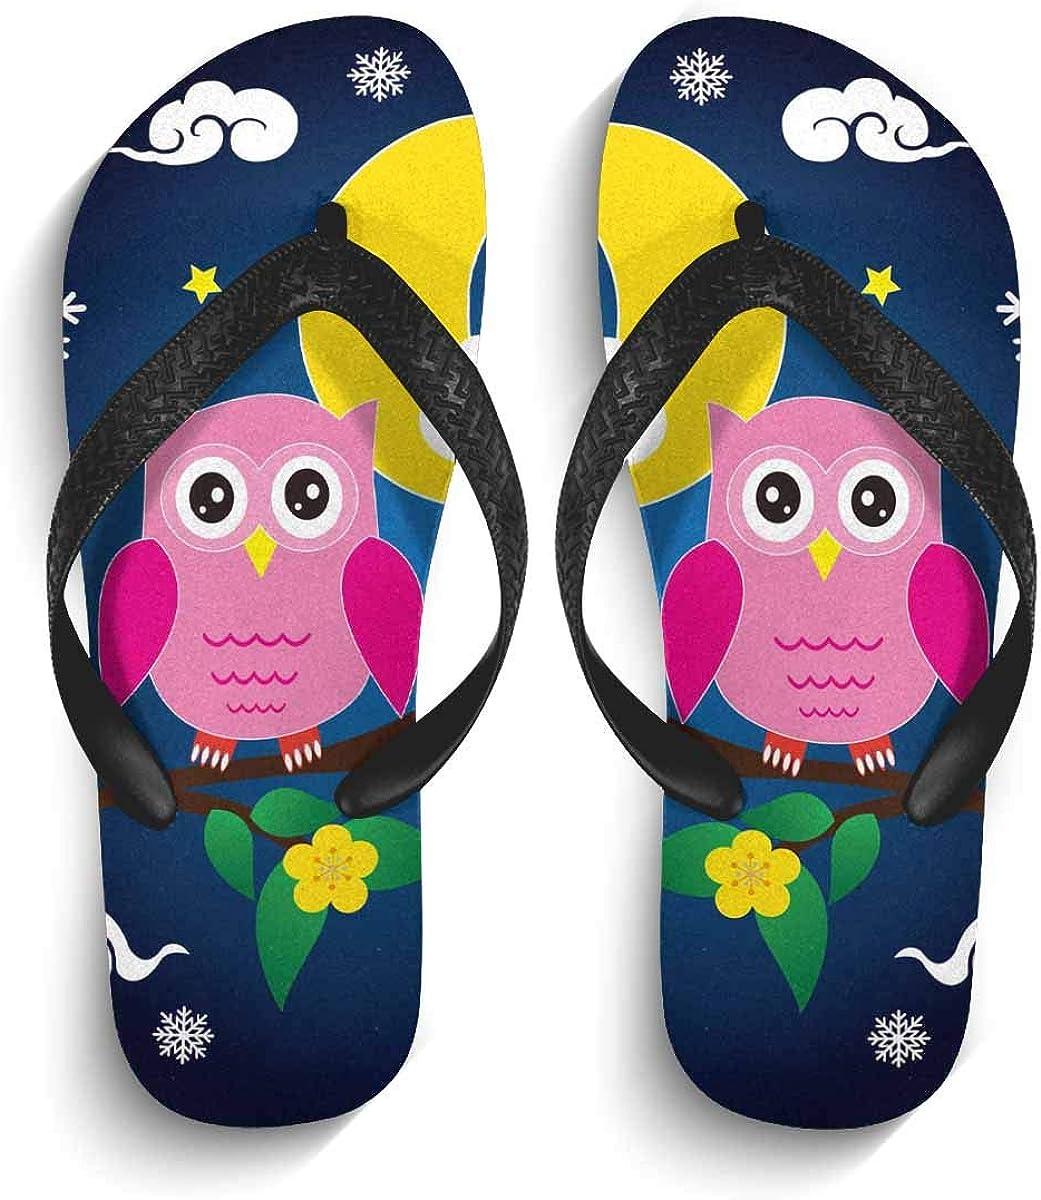 InterestPrint Non-Slip Flip Flops Sandal Cute Owl Unique Snowflakes Winter Lightweight Summer Beach Thong Slippers for Men L